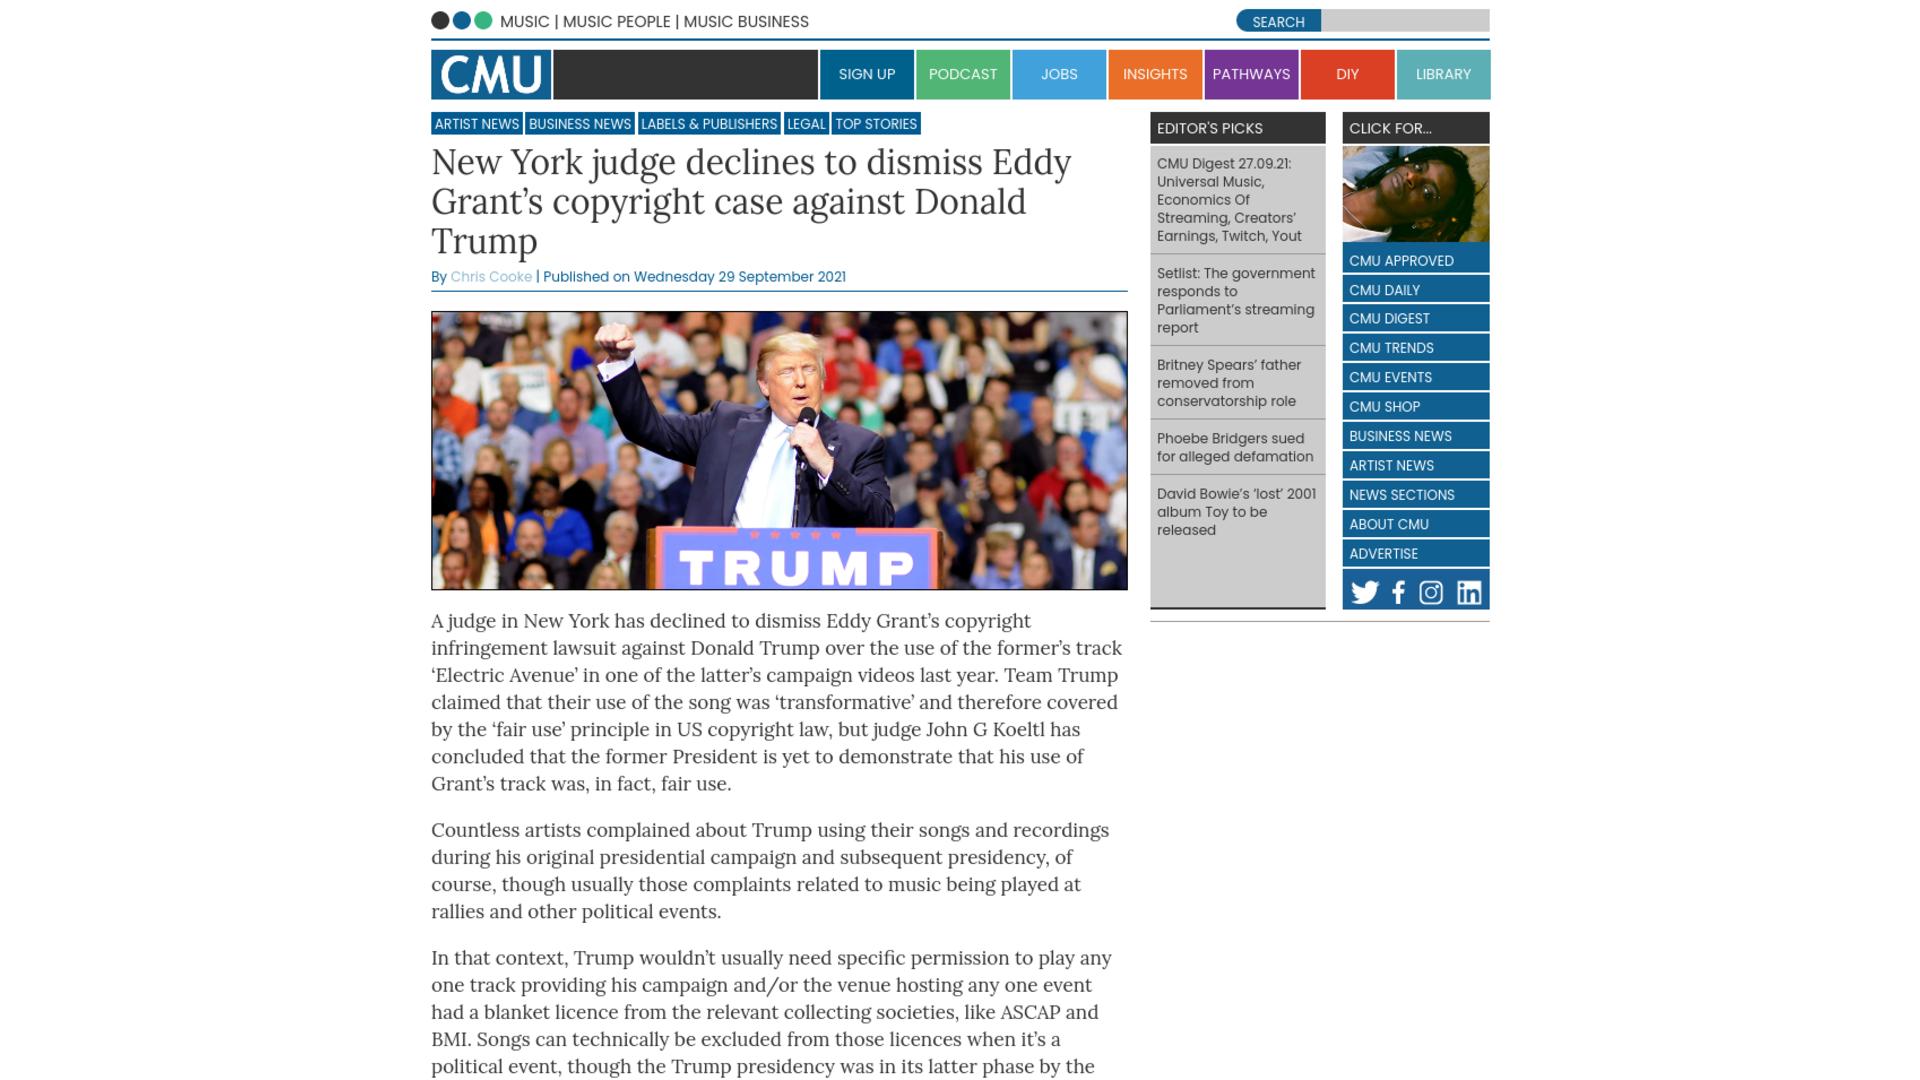 Fairness Rocks News New York judge declines to dismiss Eddy Grant's copyright case against Donald Trump